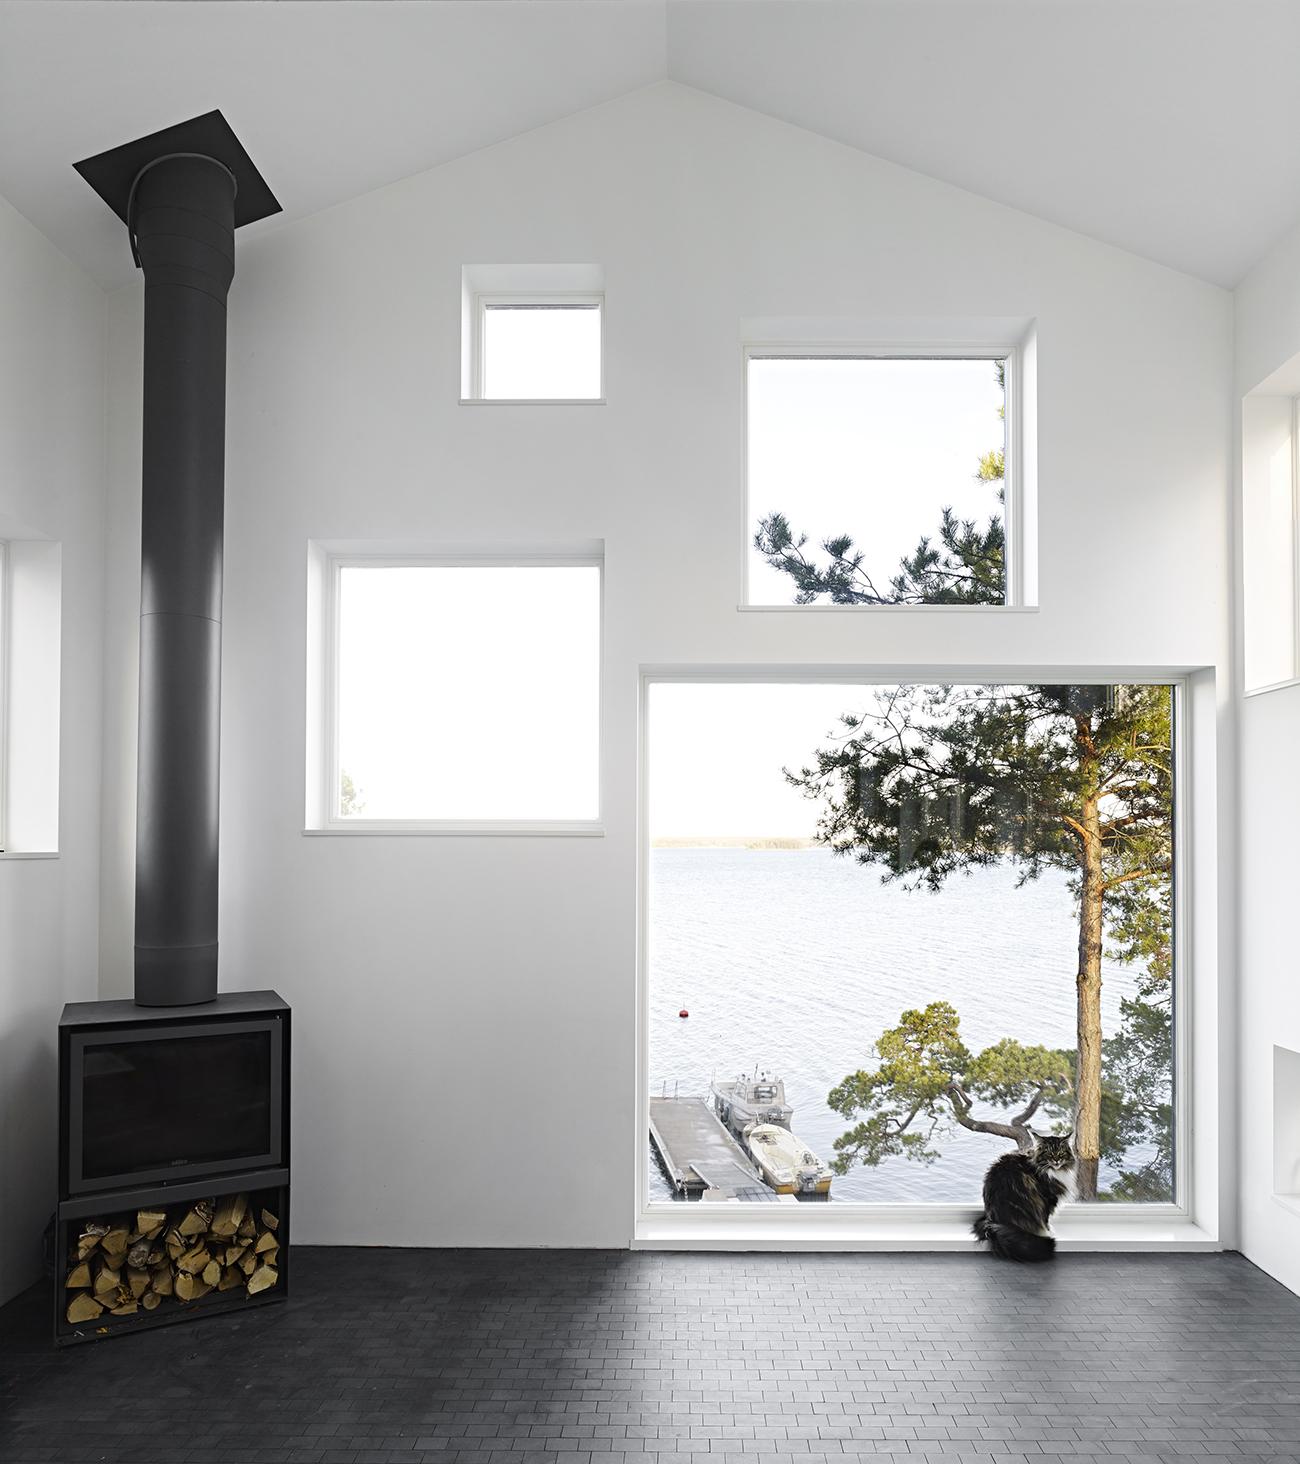 Guise create Villa Elgö, a modern lakeside cabin outside Stockholm | KNSTRCT